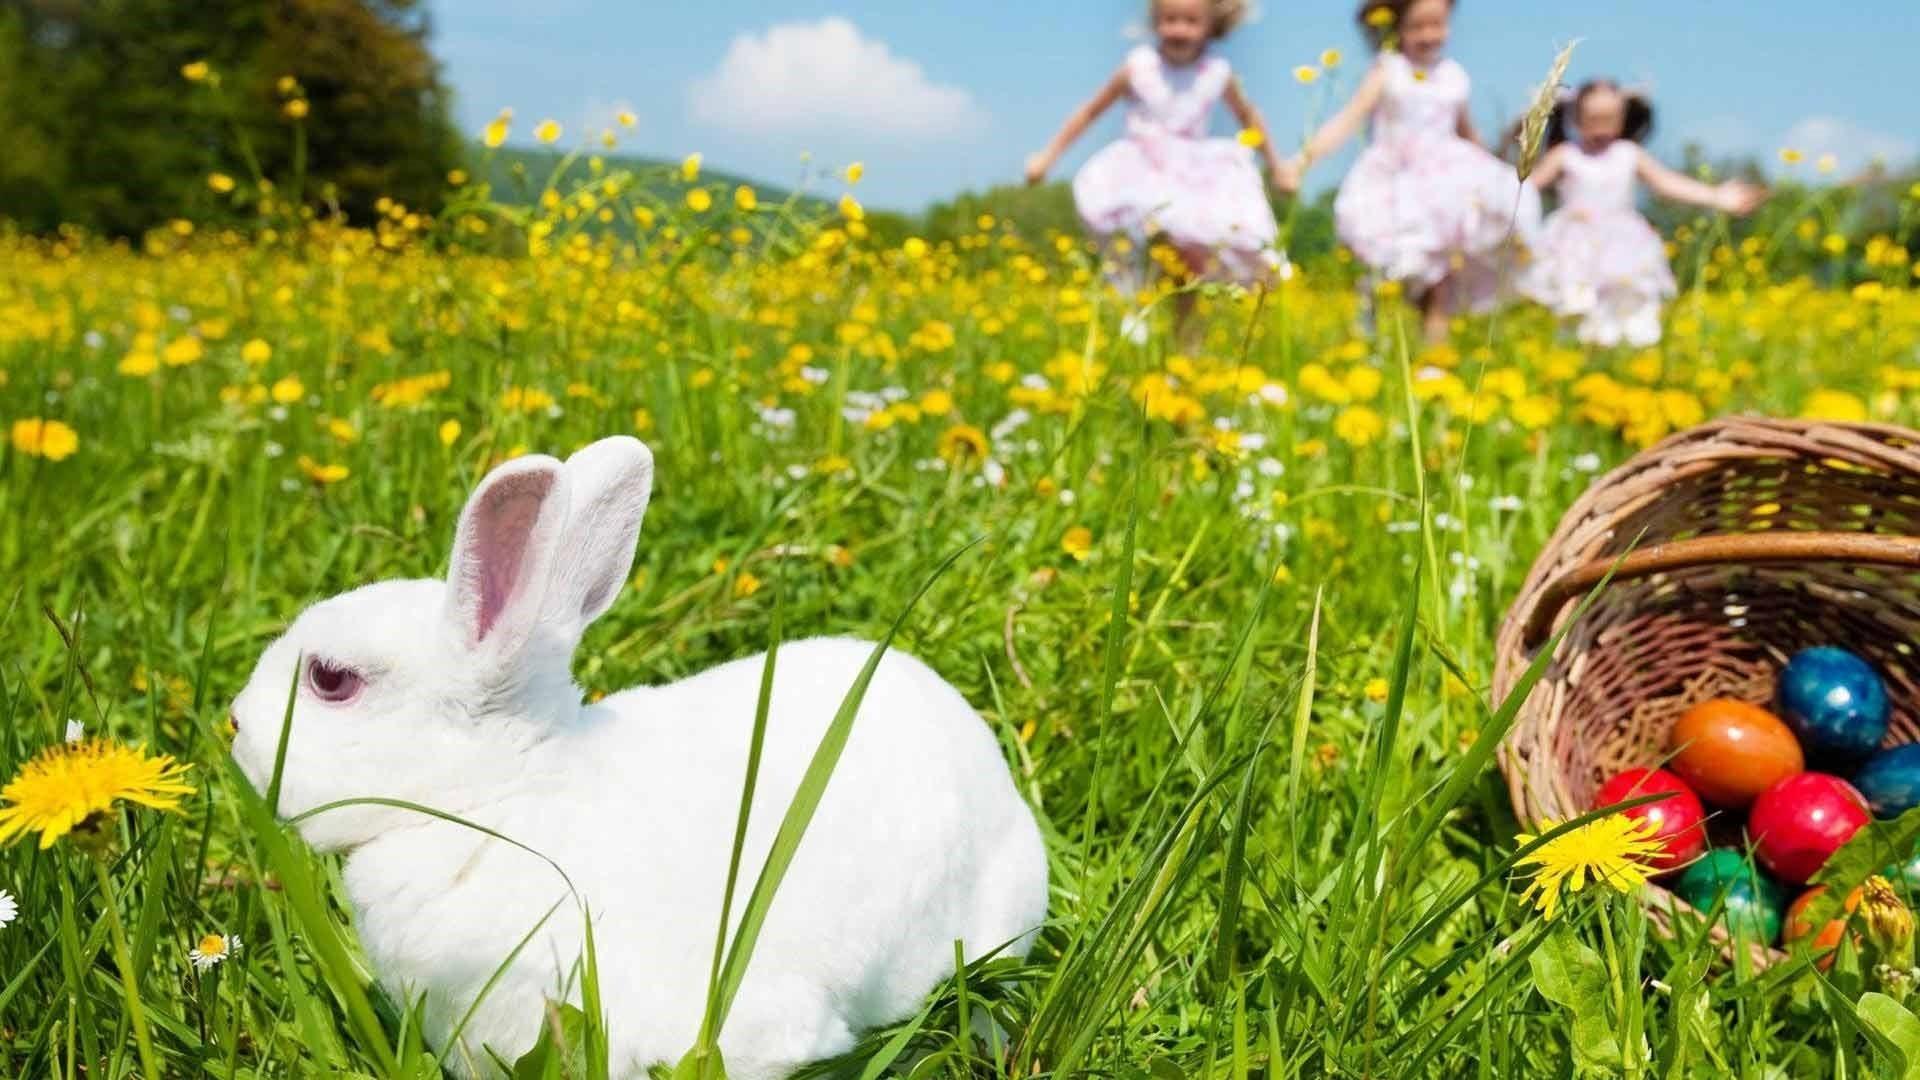 Cute Easter Wallpaper HD